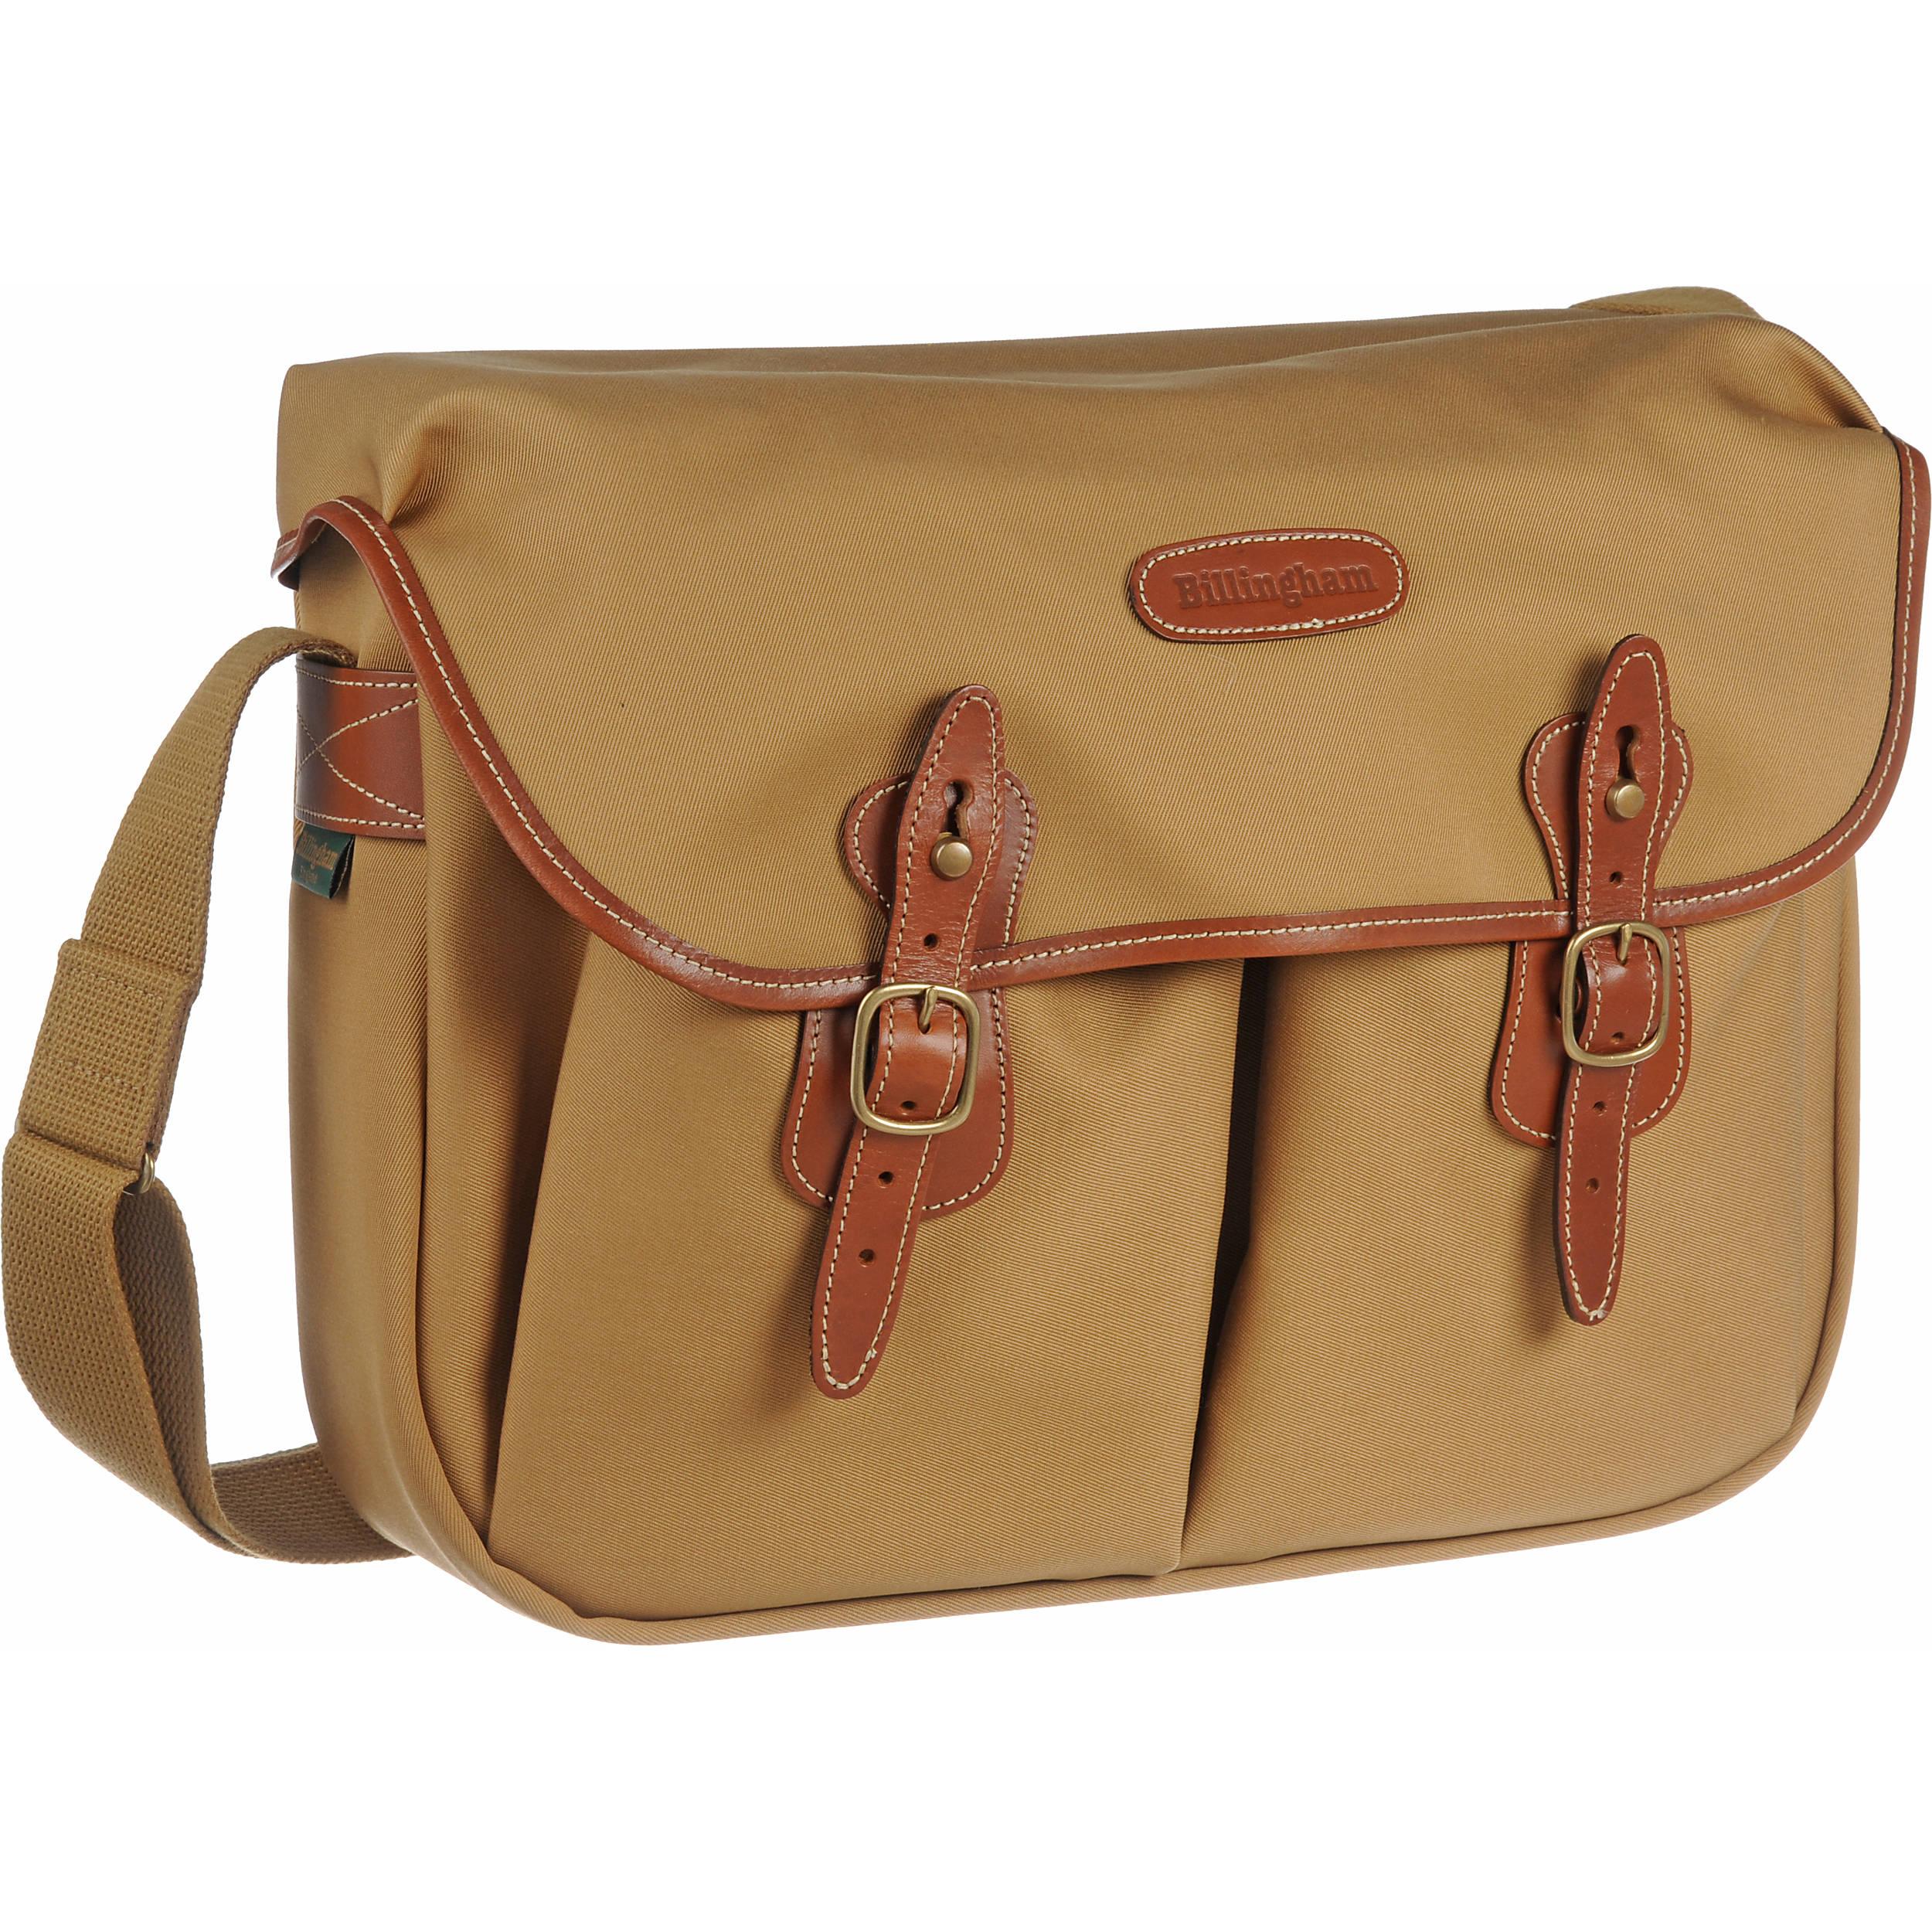 17b52bf7584d Billingham Hadley Large Canvas Shoulder Bag (Khaki with Tan Leather Trim)